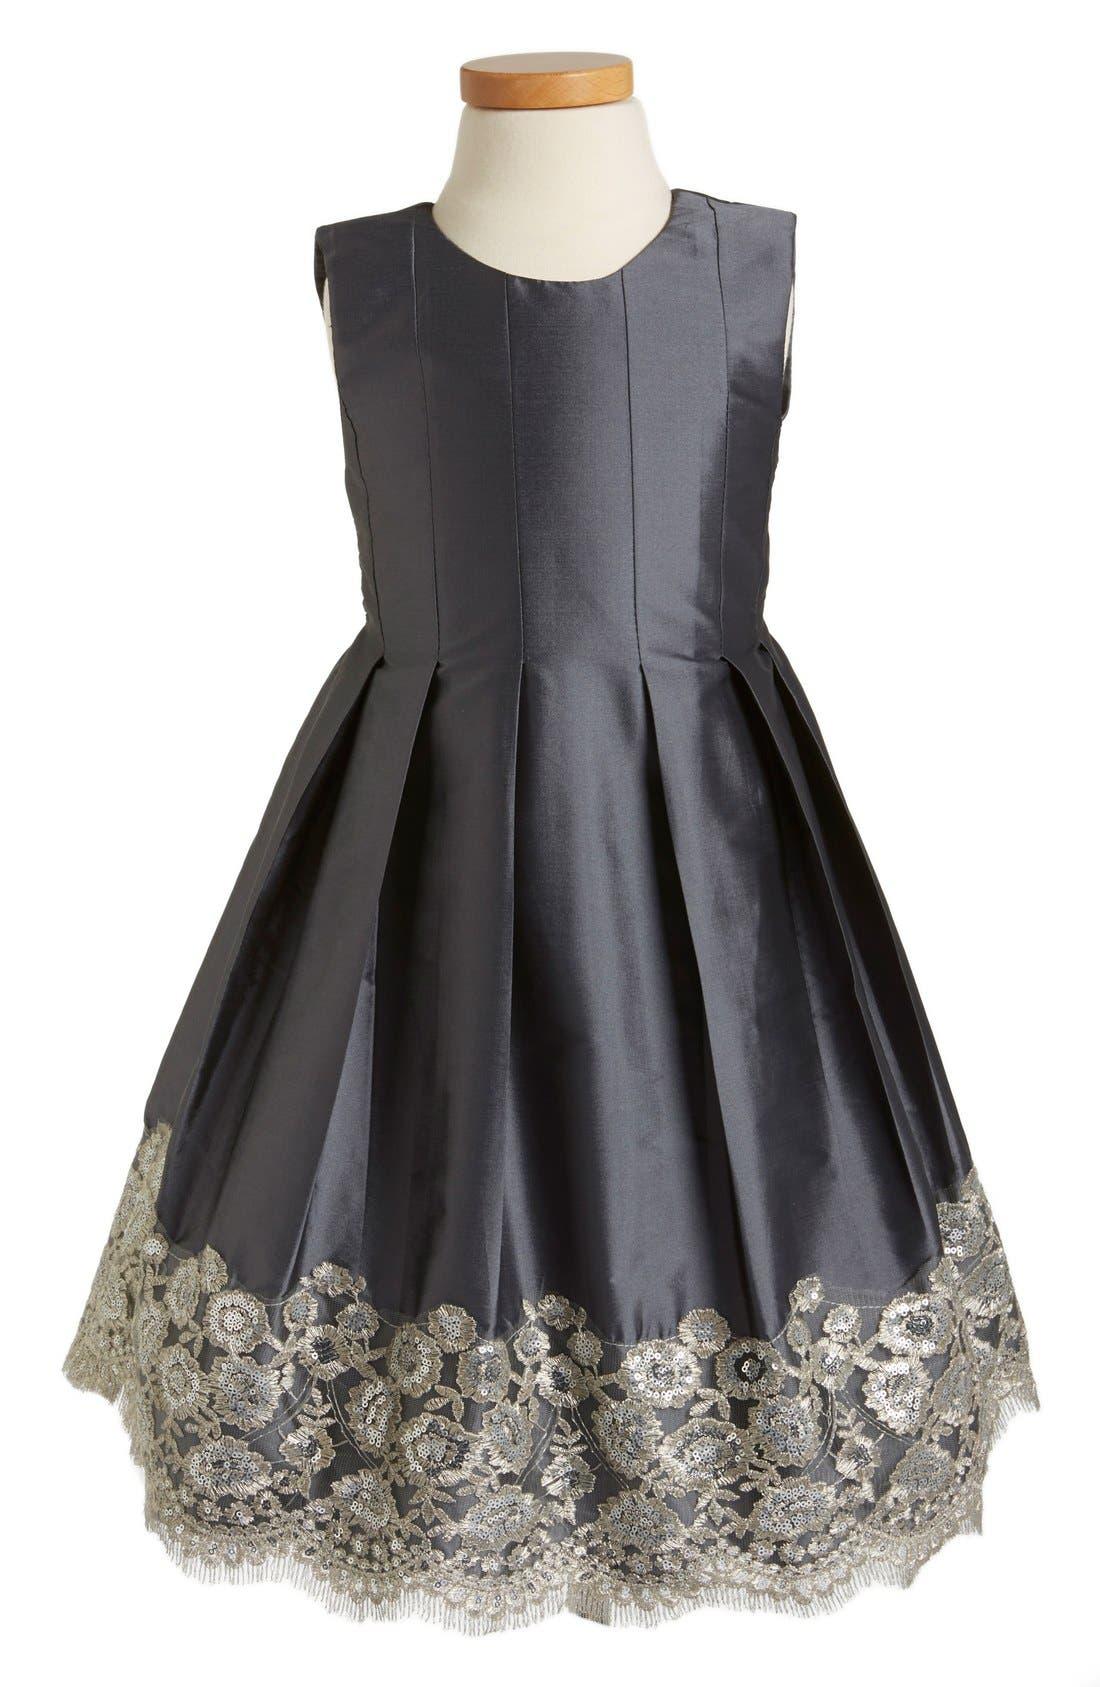 Main Image - Isabel Garreton Floral Lace Pleated Dress (Toddler Girls, Little Girls & Big Girls)